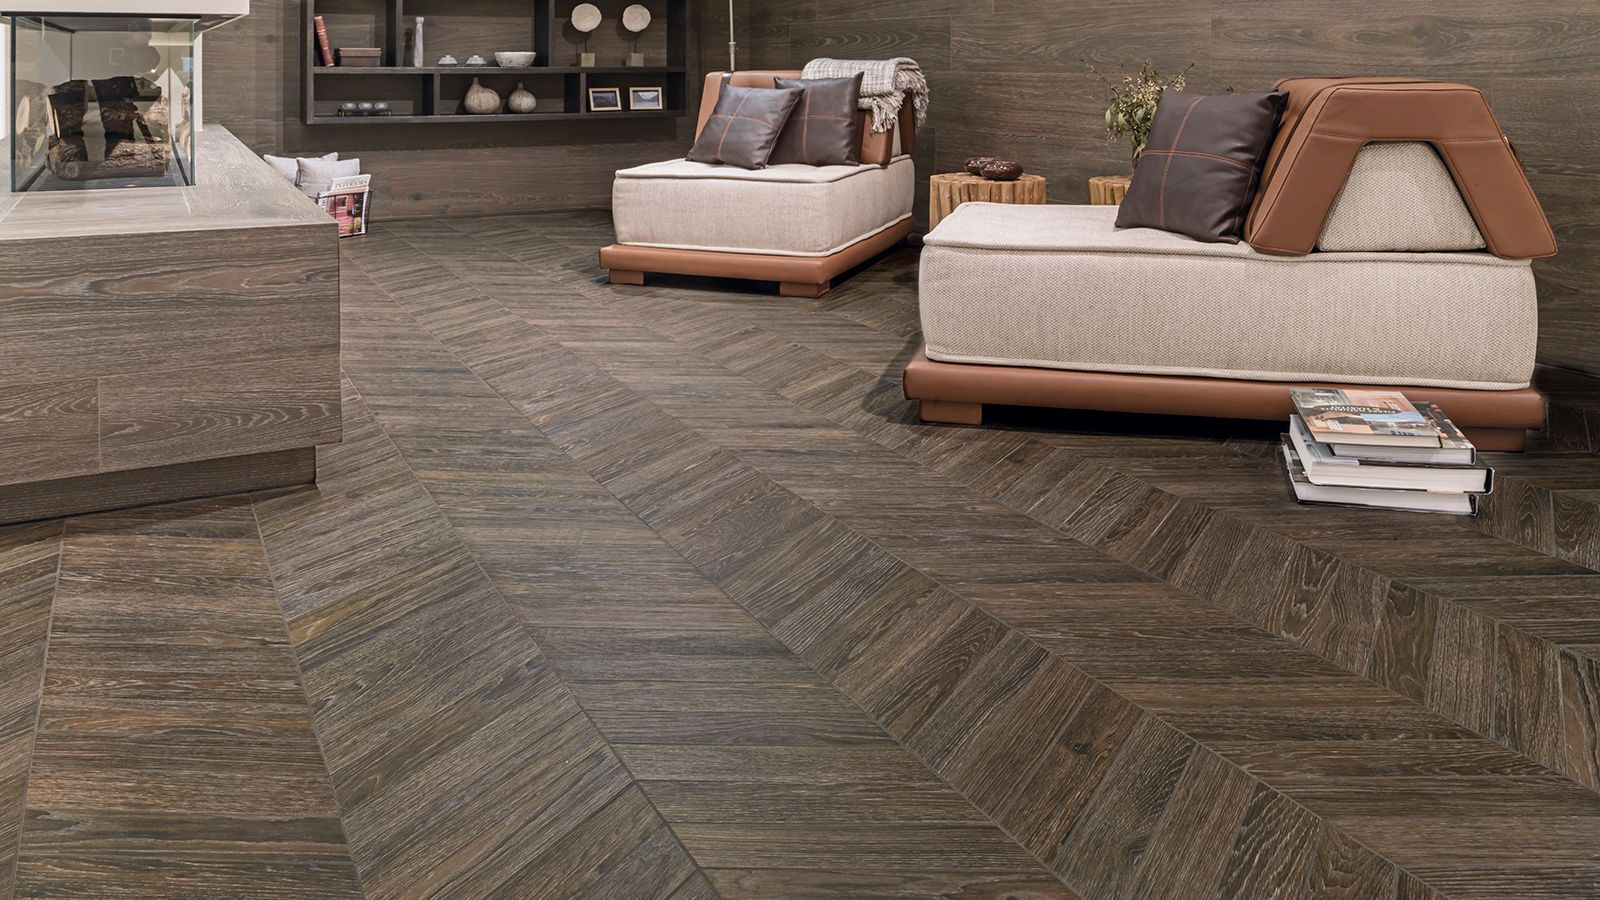 Porcelanosa Starwood Espiga Flooring Wood Effect Floor Tiles Tile Floor